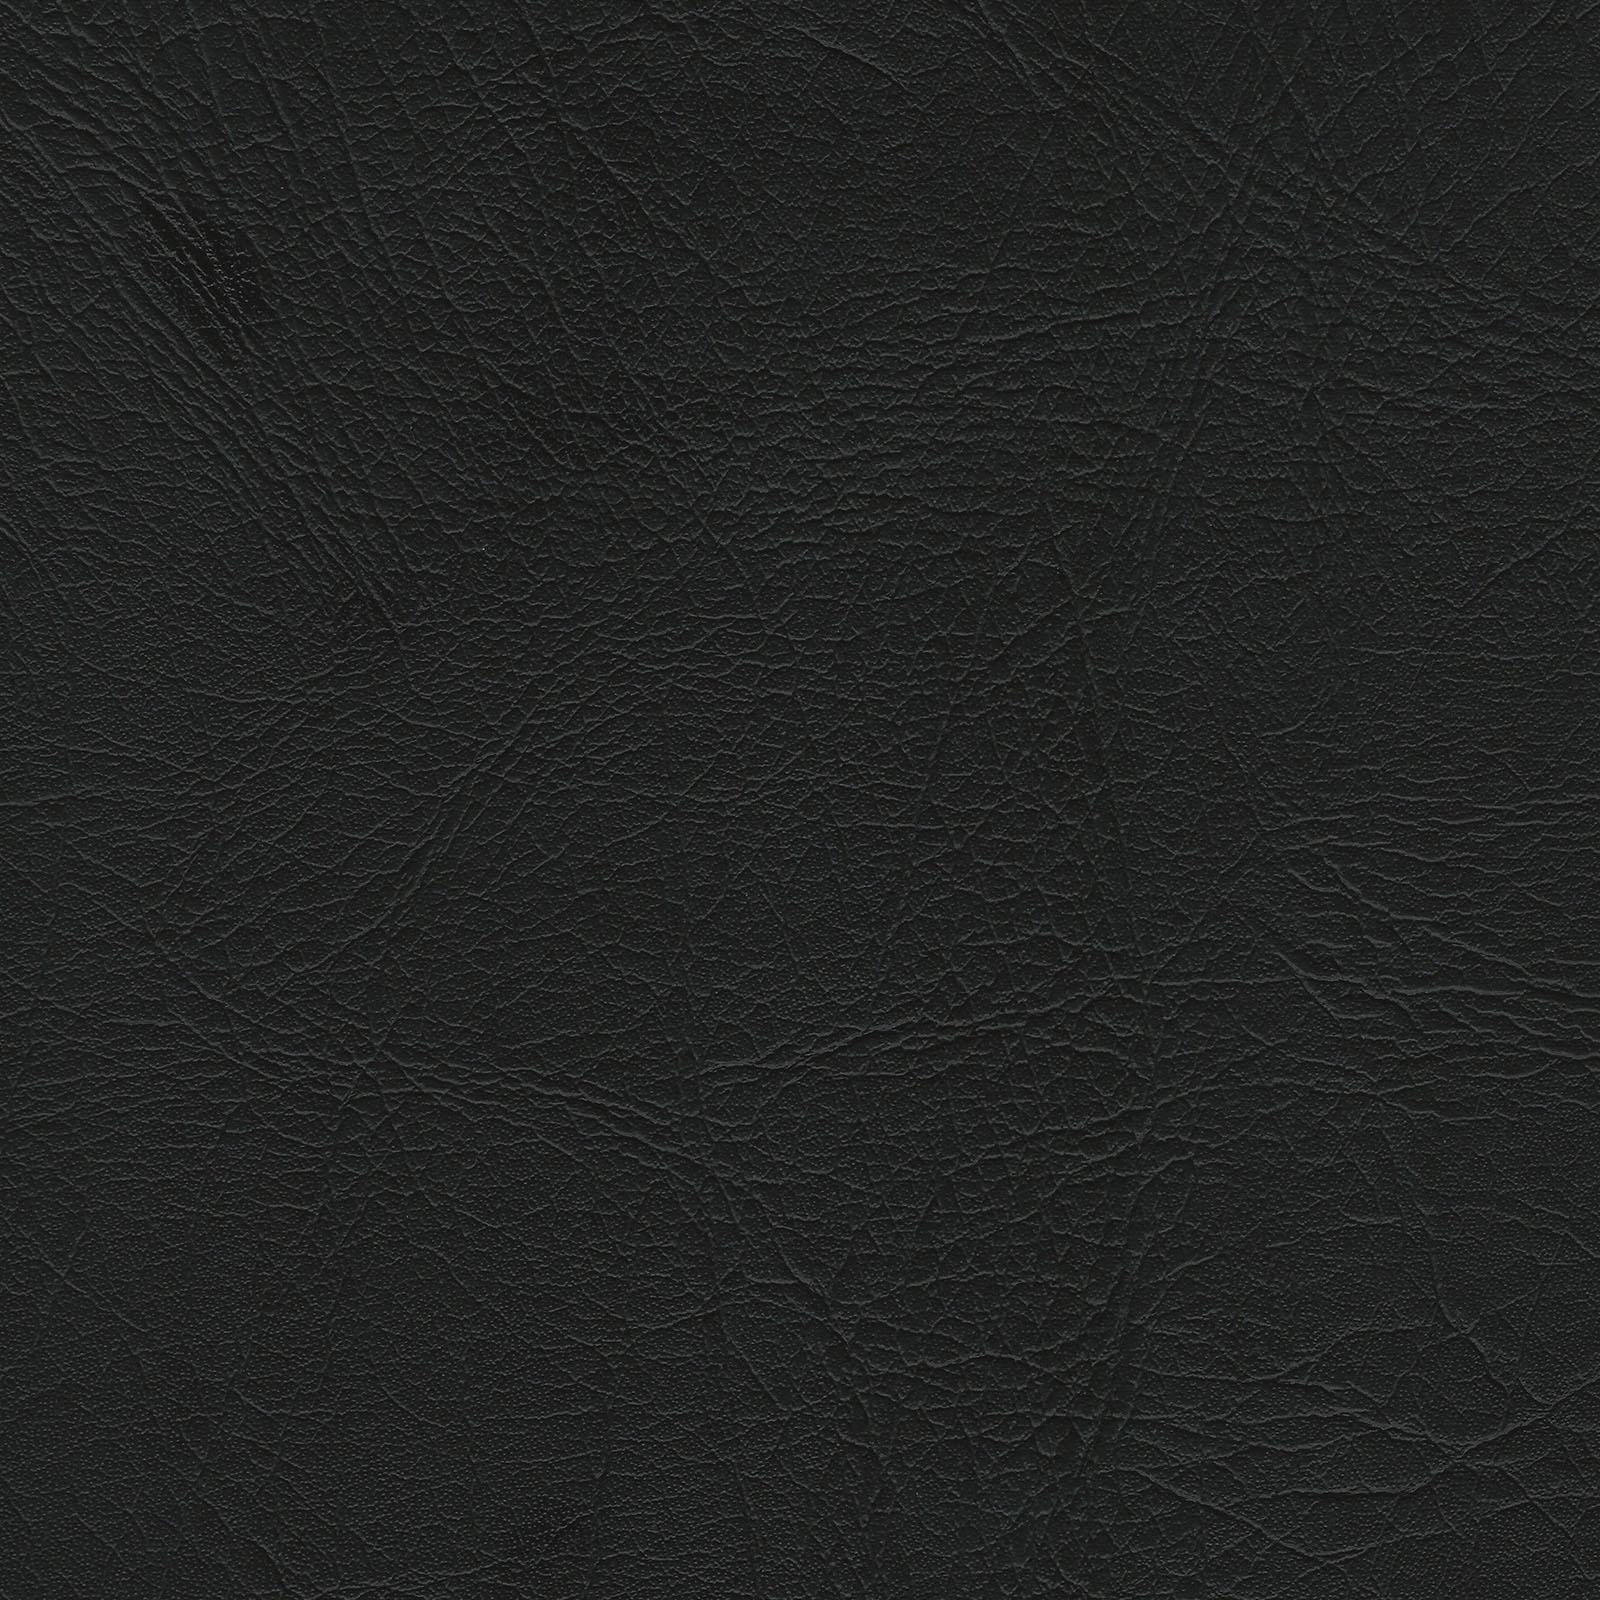 EZ Vinyl - EZY-5834 - Madrid Black